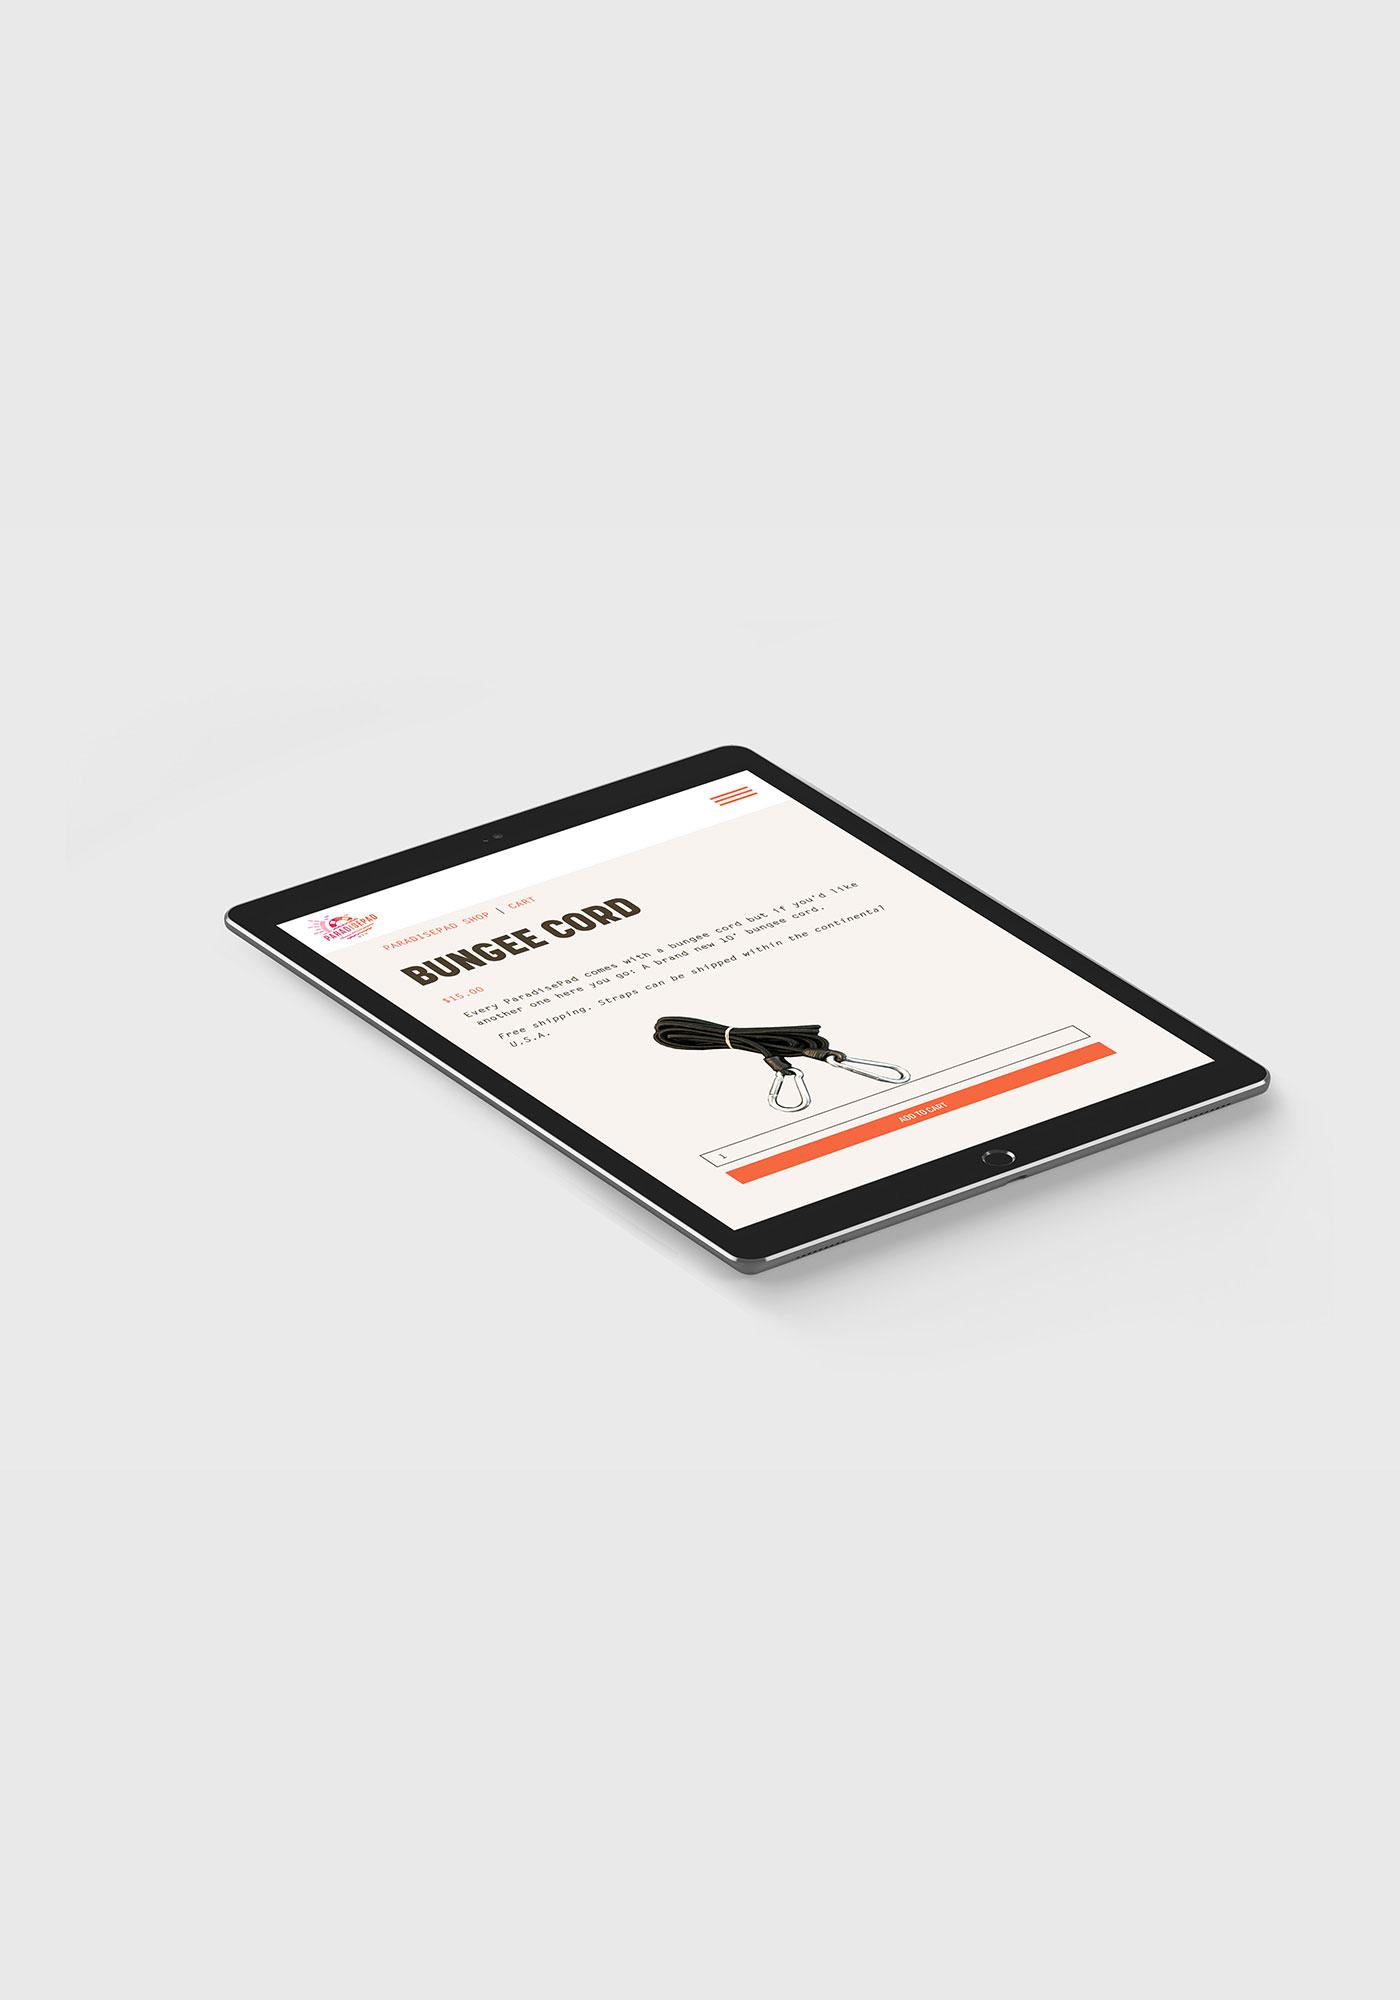 Ecommerce web design company